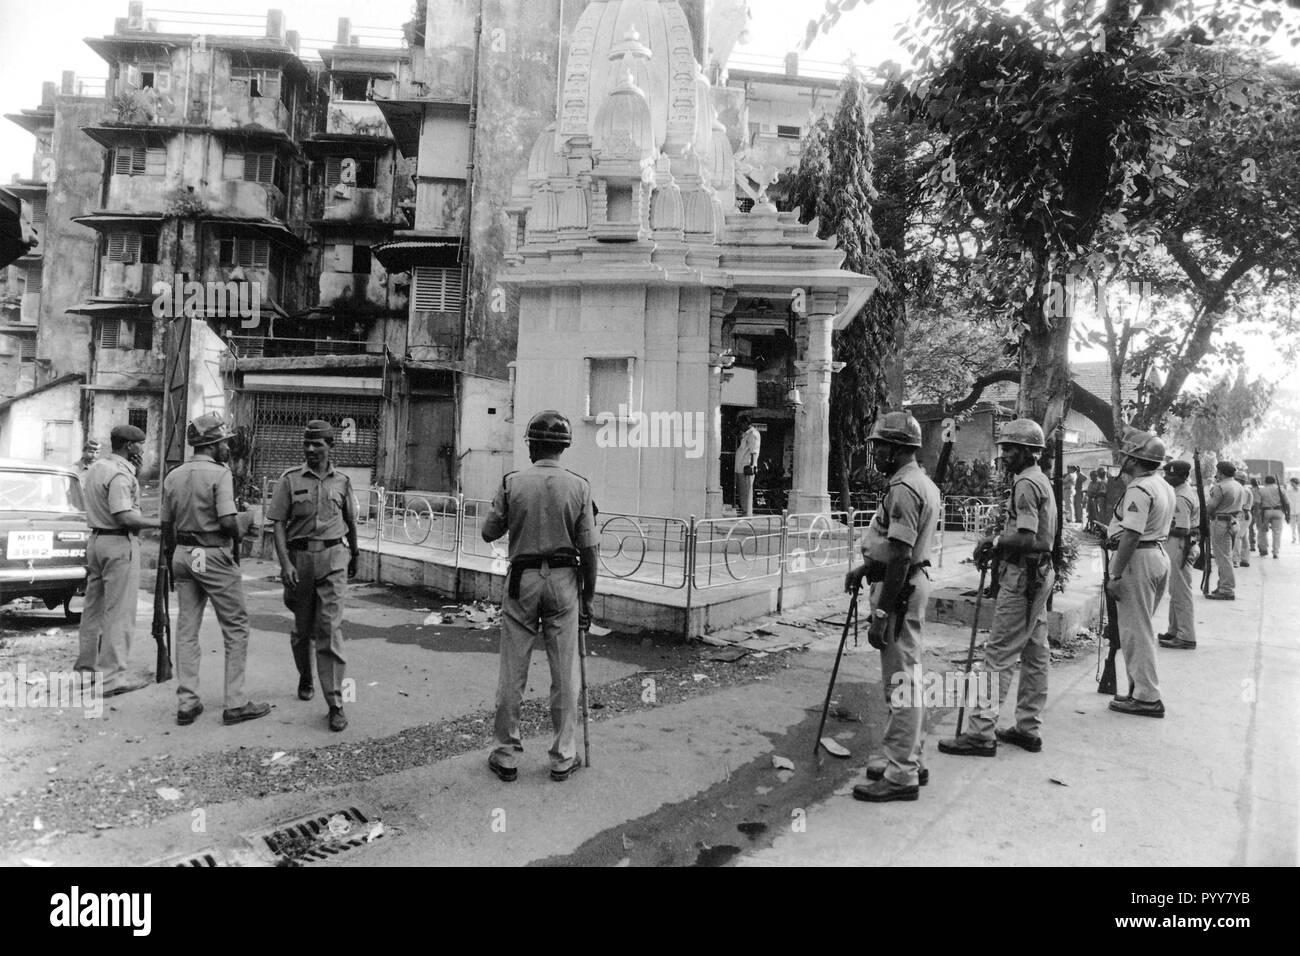 Police men guarding Hindu Shiva temple in riots, Mumbai, Maharashtra, India, Asia, 1900s - Stock Image